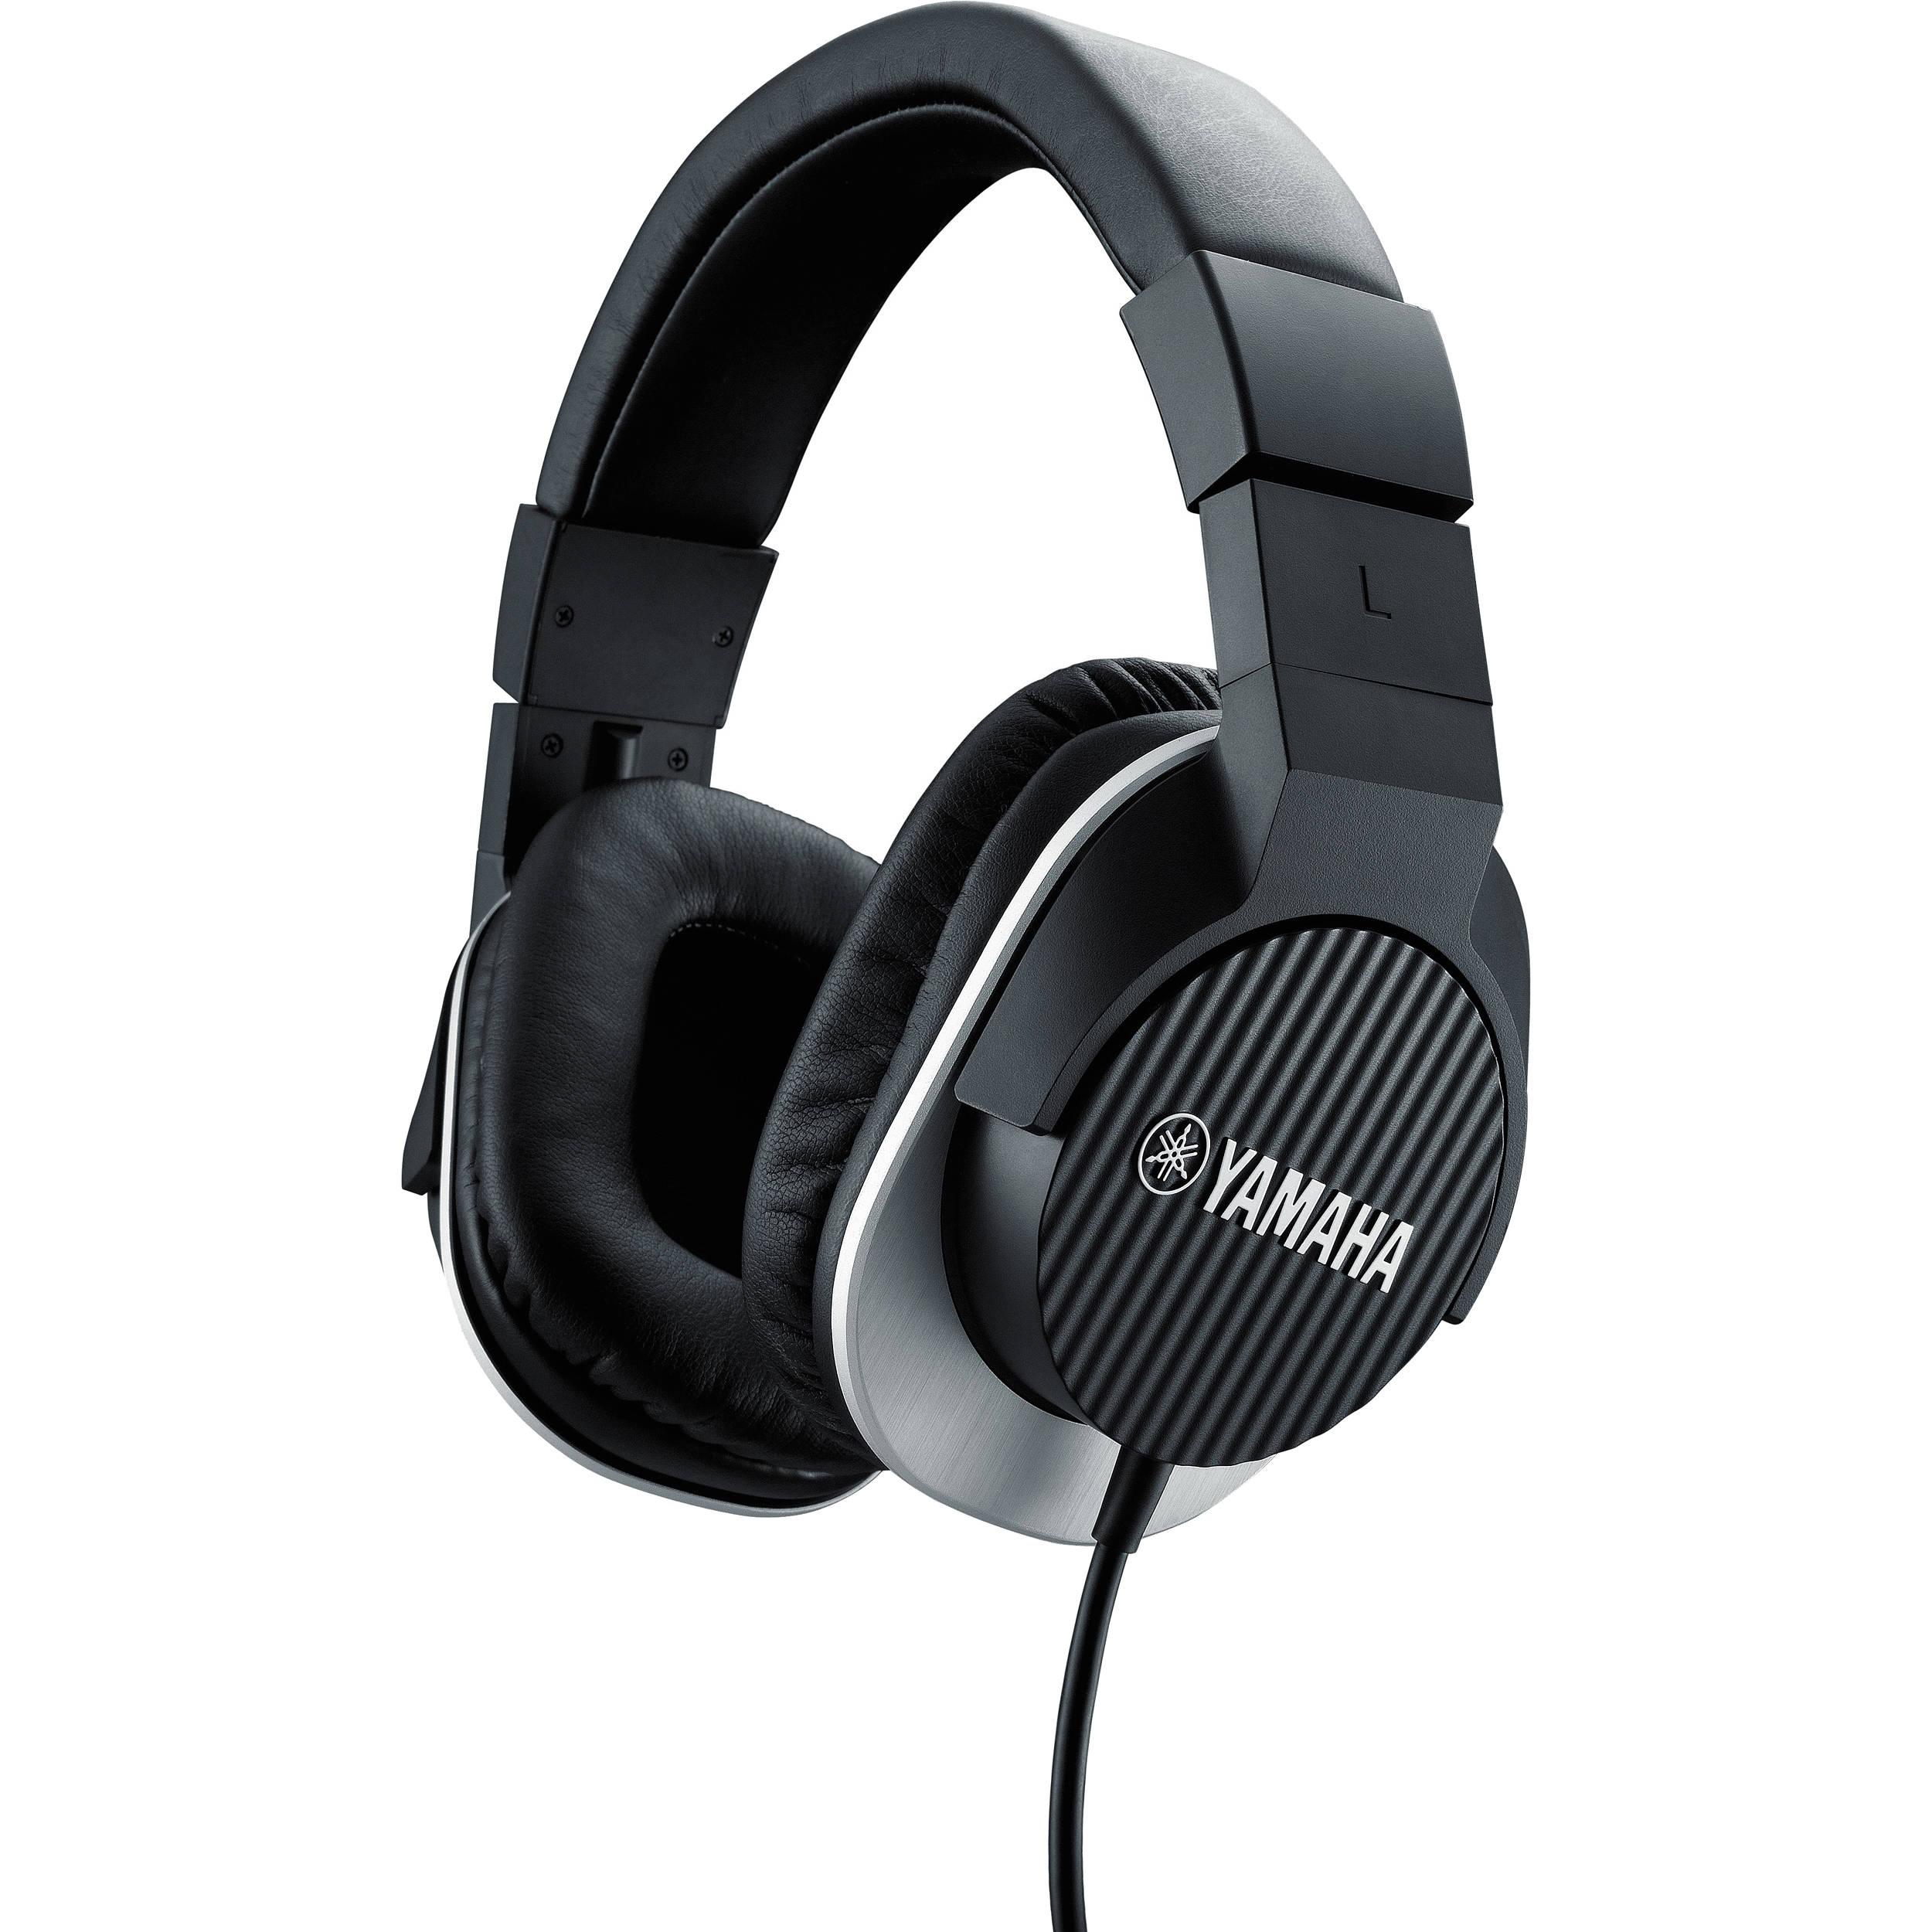 yamaha hph mt220 studio monitor headphones black hph mt220bl. Black Bedroom Furniture Sets. Home Design Ideas